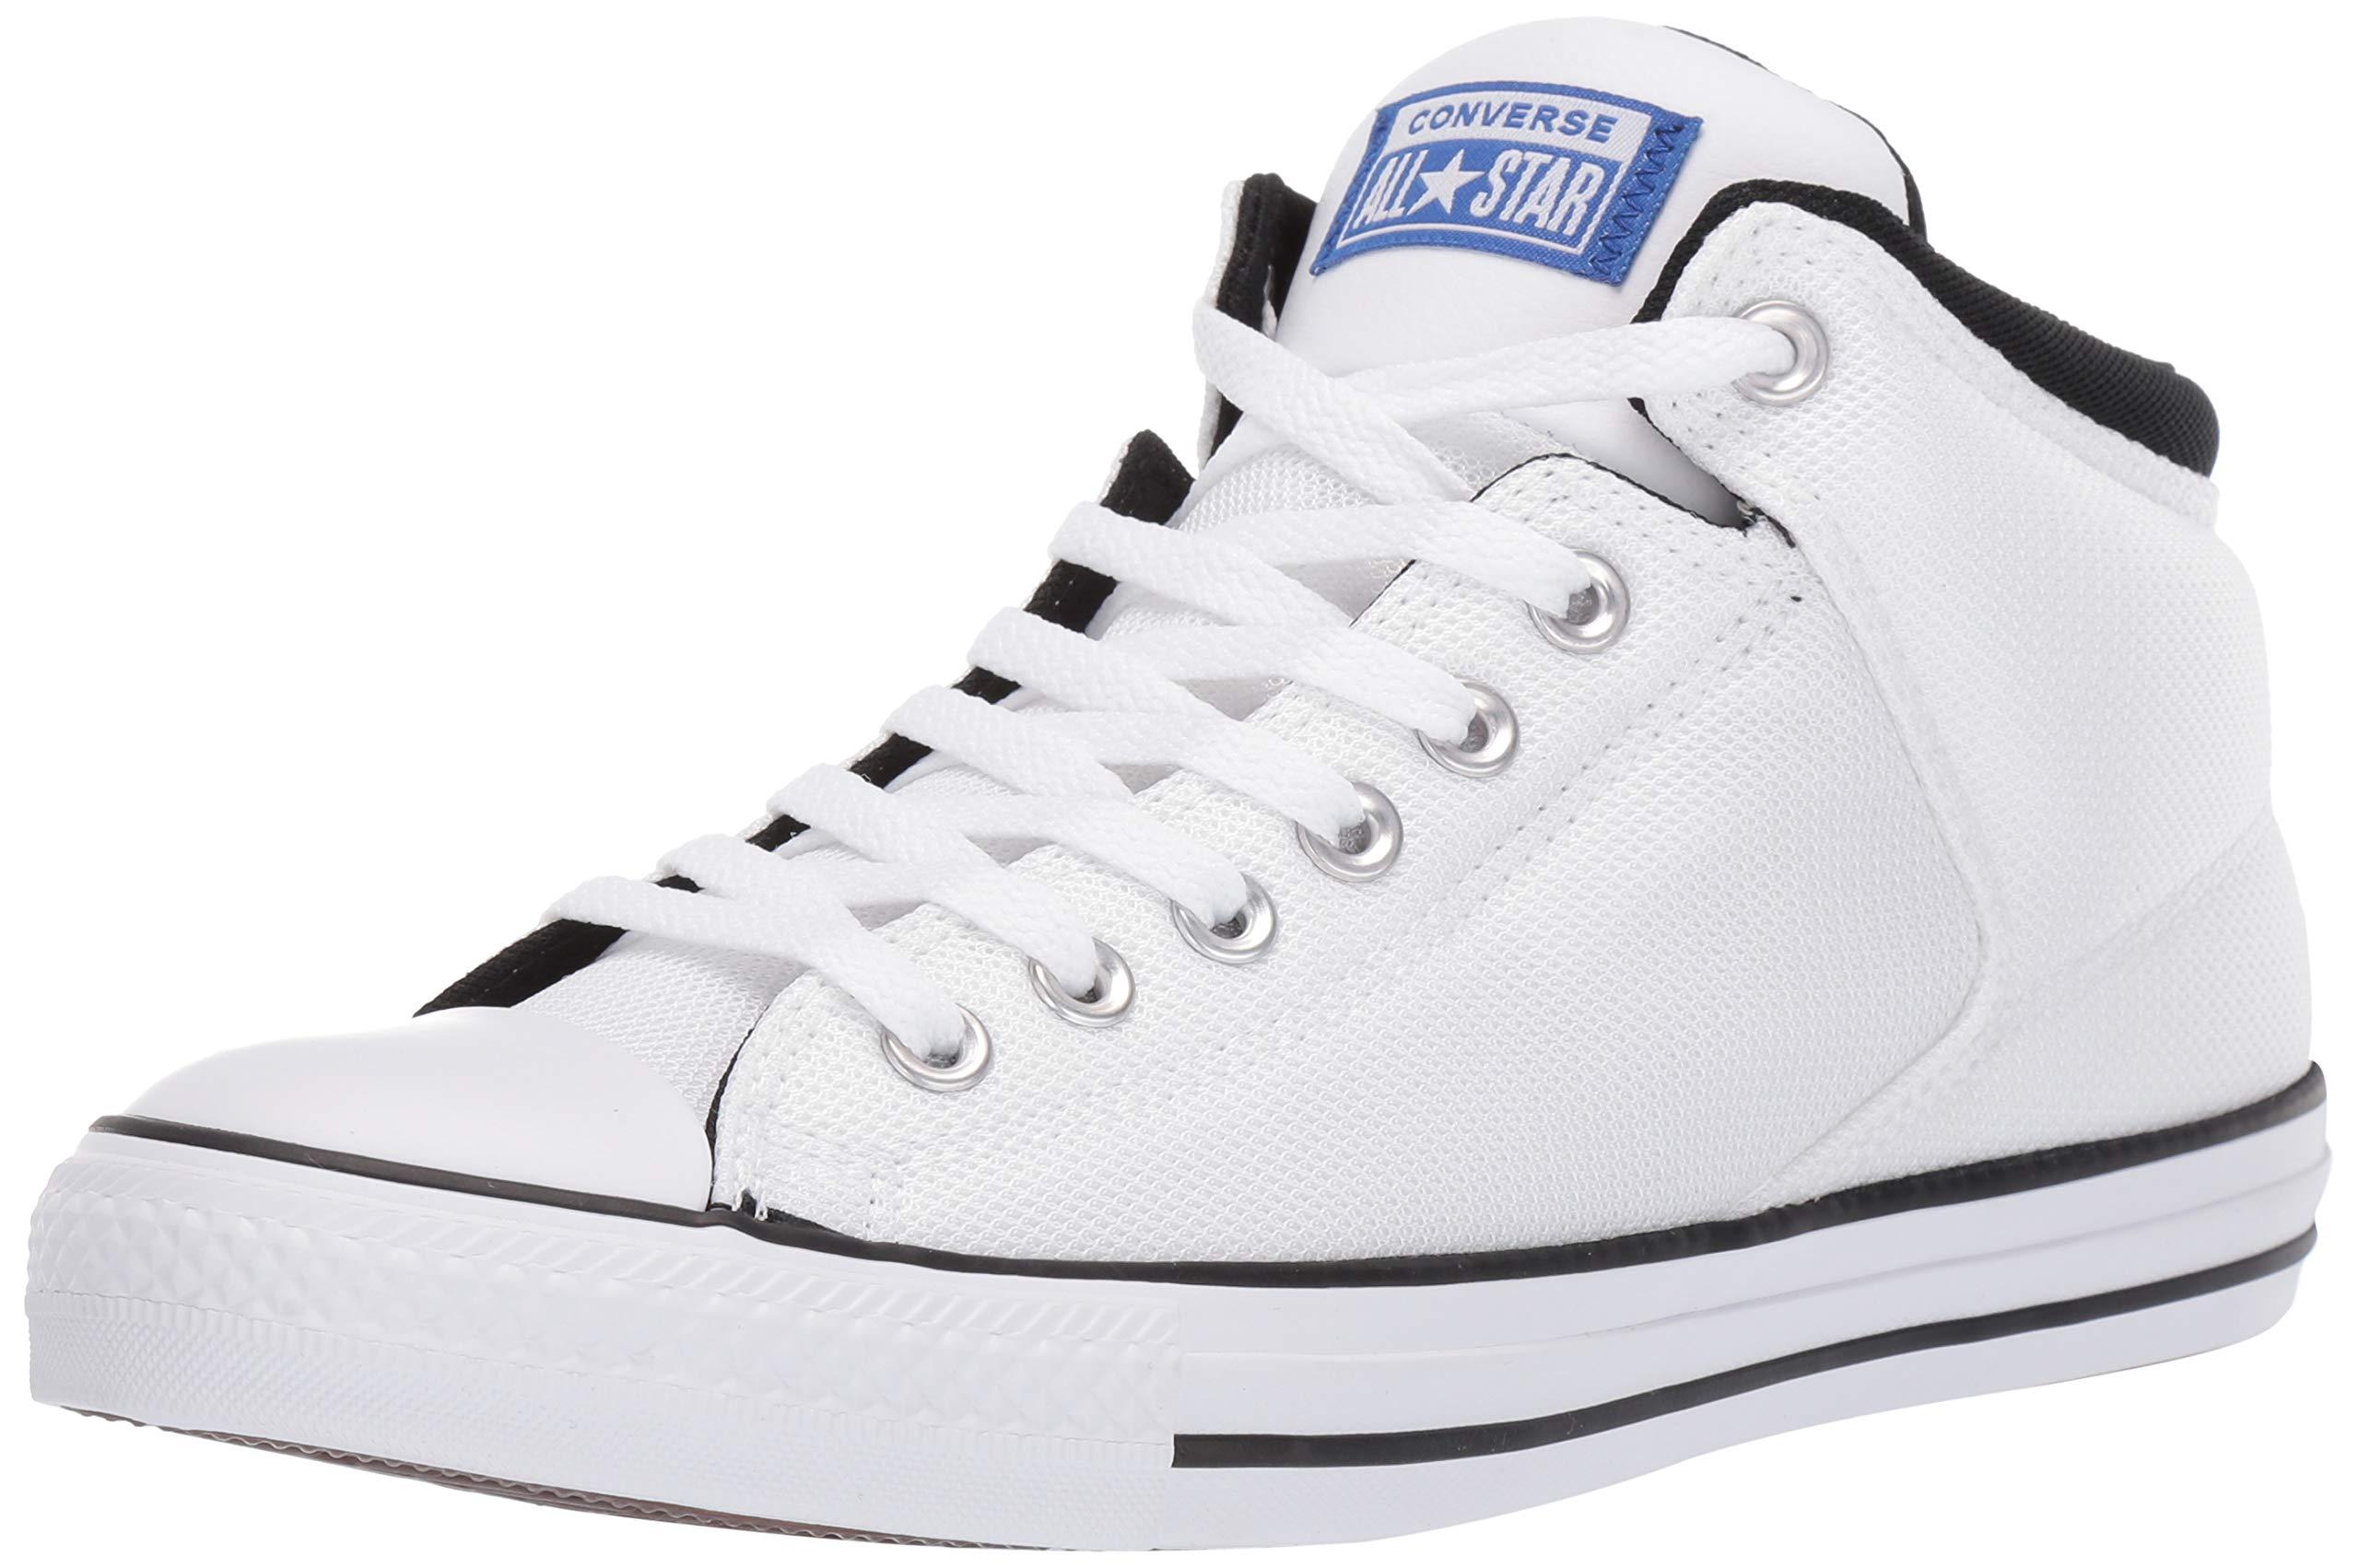 Converse Men's Unisex Chuck Taylor All Star Street High Top Sneaker, WhiteBlueBlack 8 M US